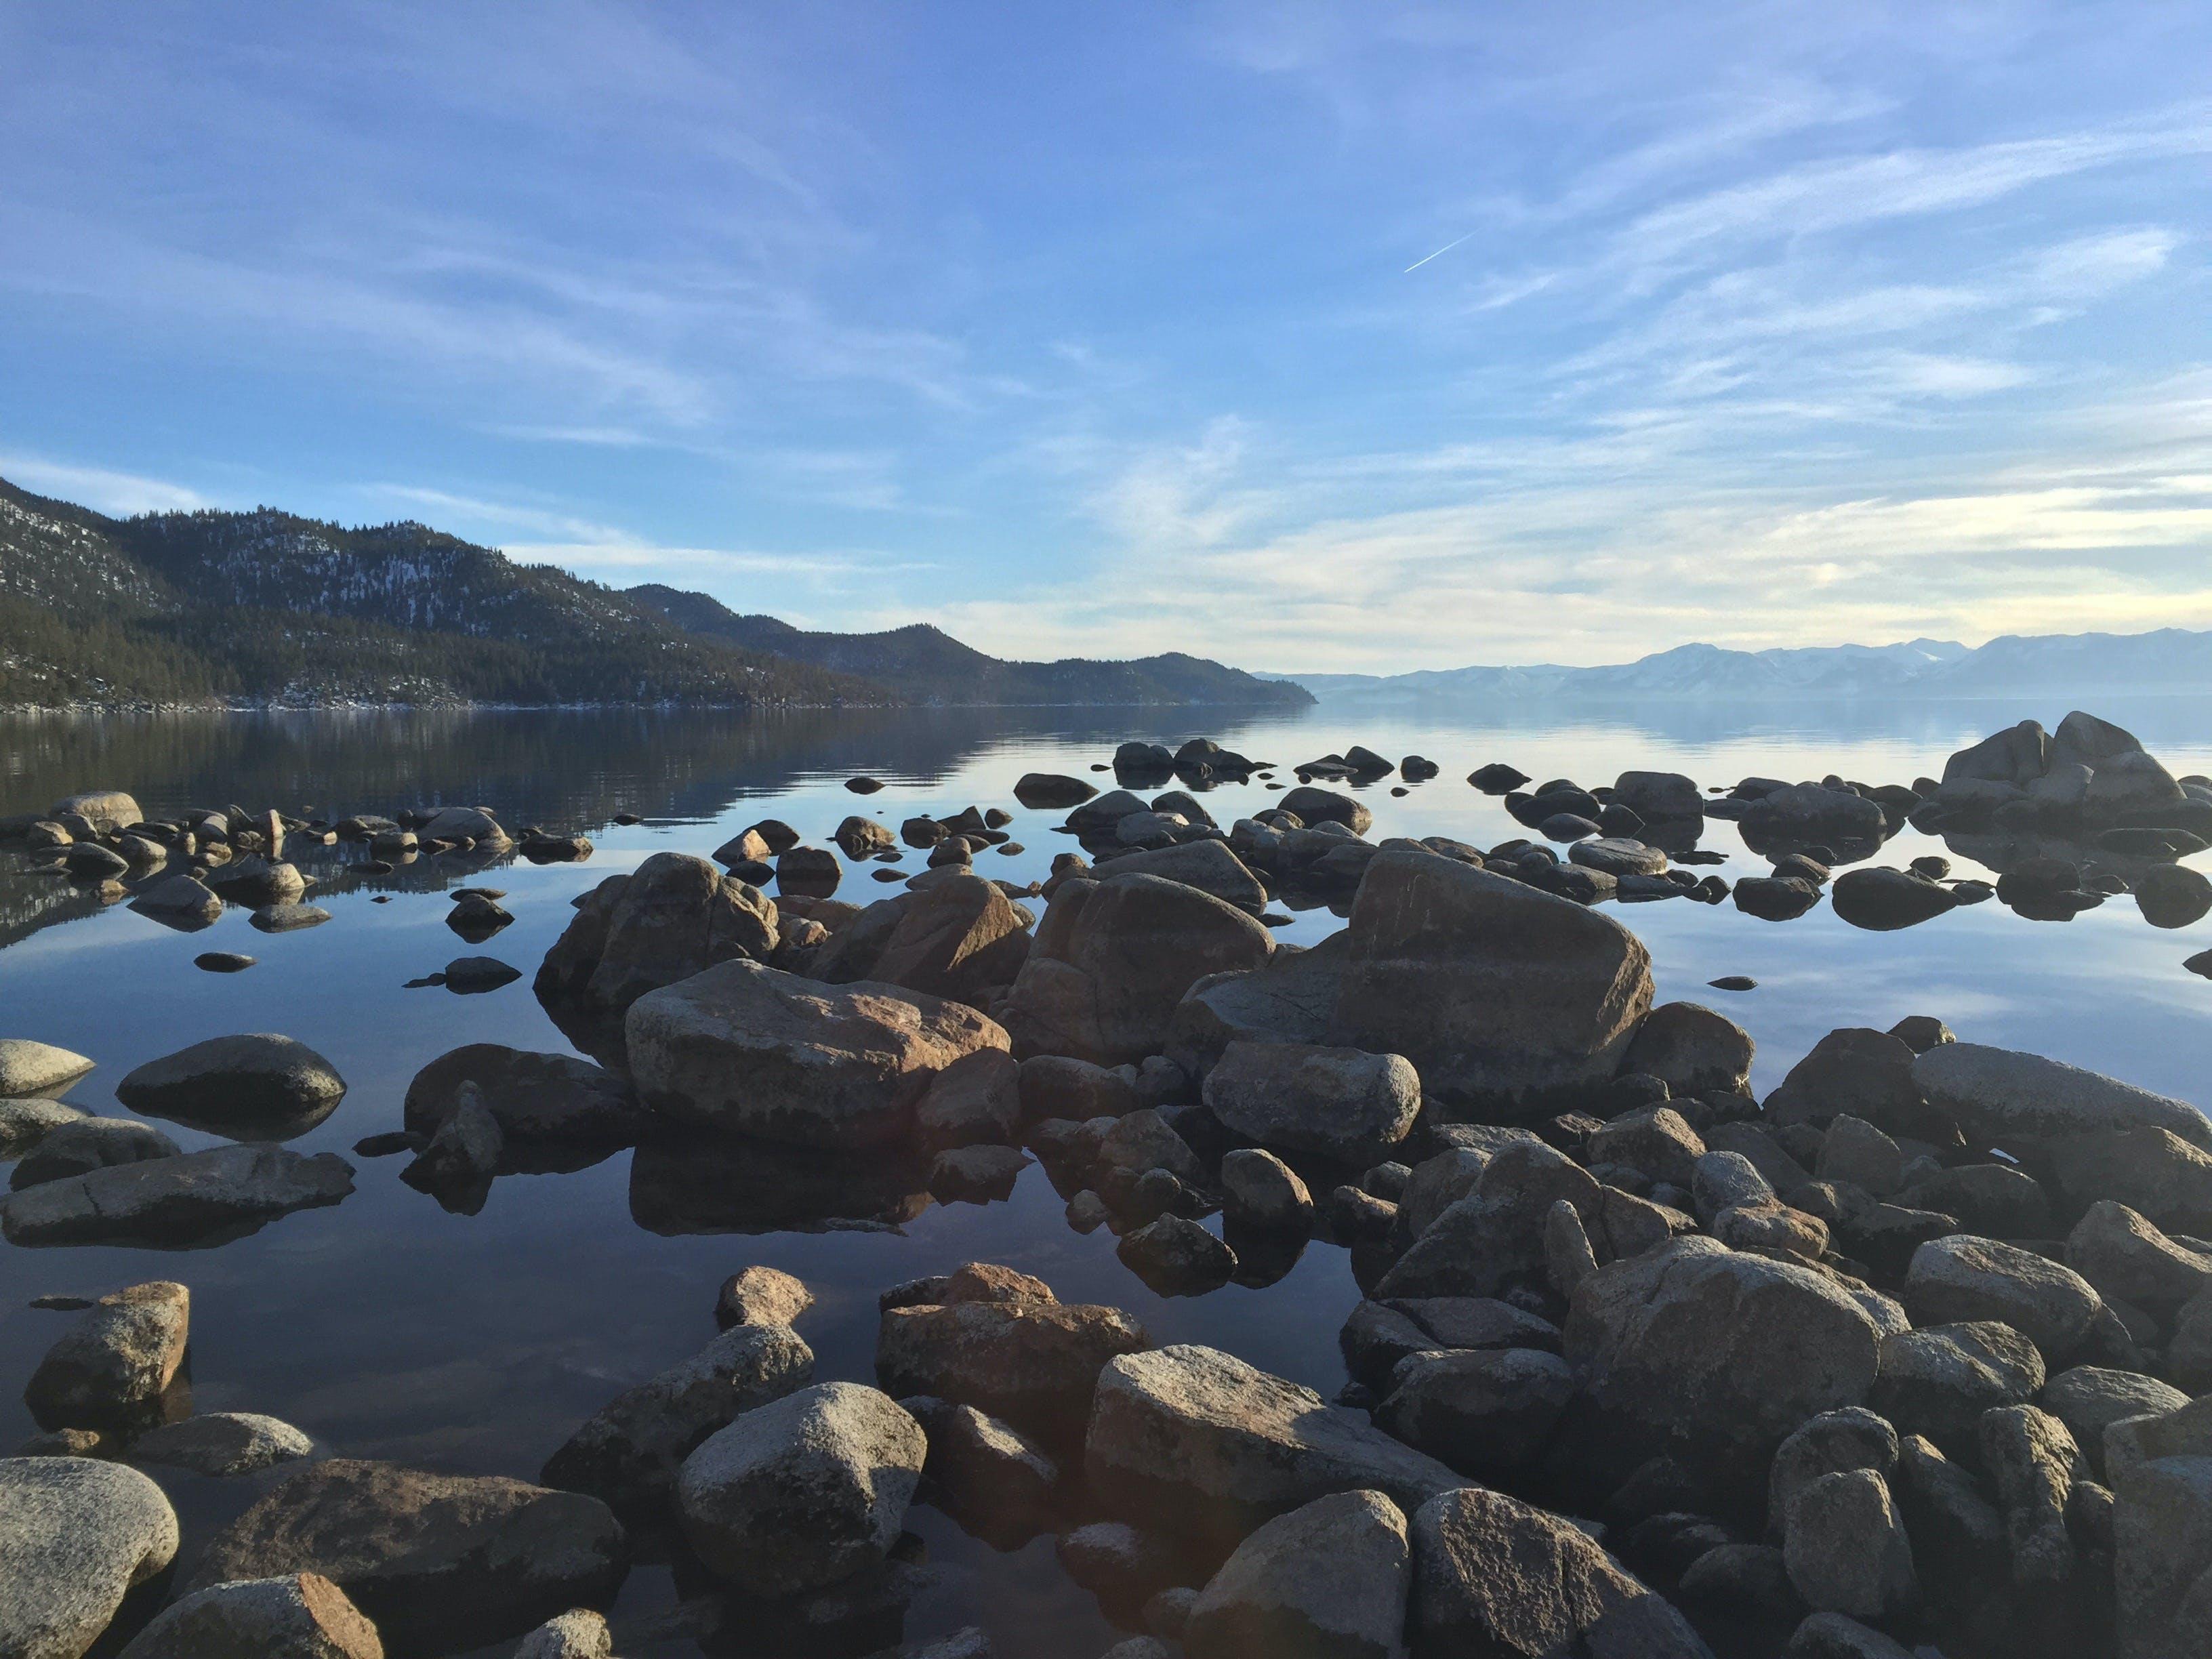 Free stock photo of nature, water, rocks, lake